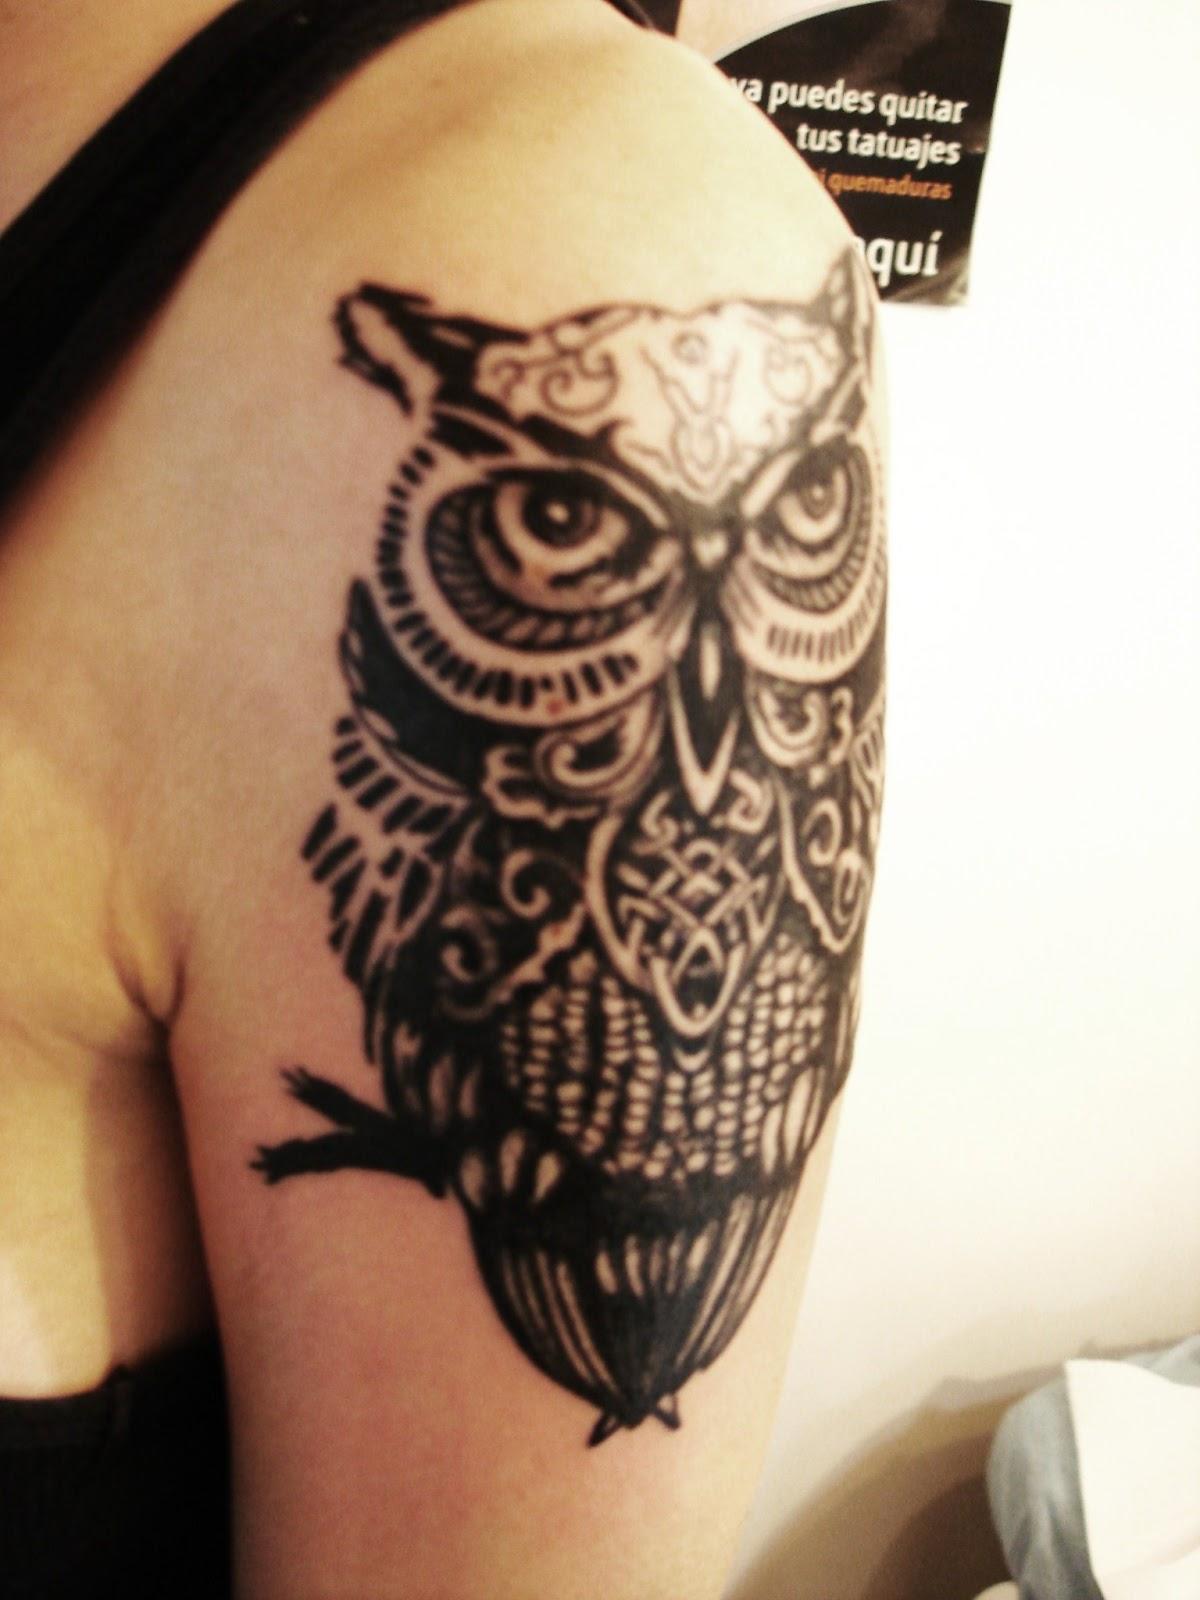 Toop Tattoo: Buho Tattoo